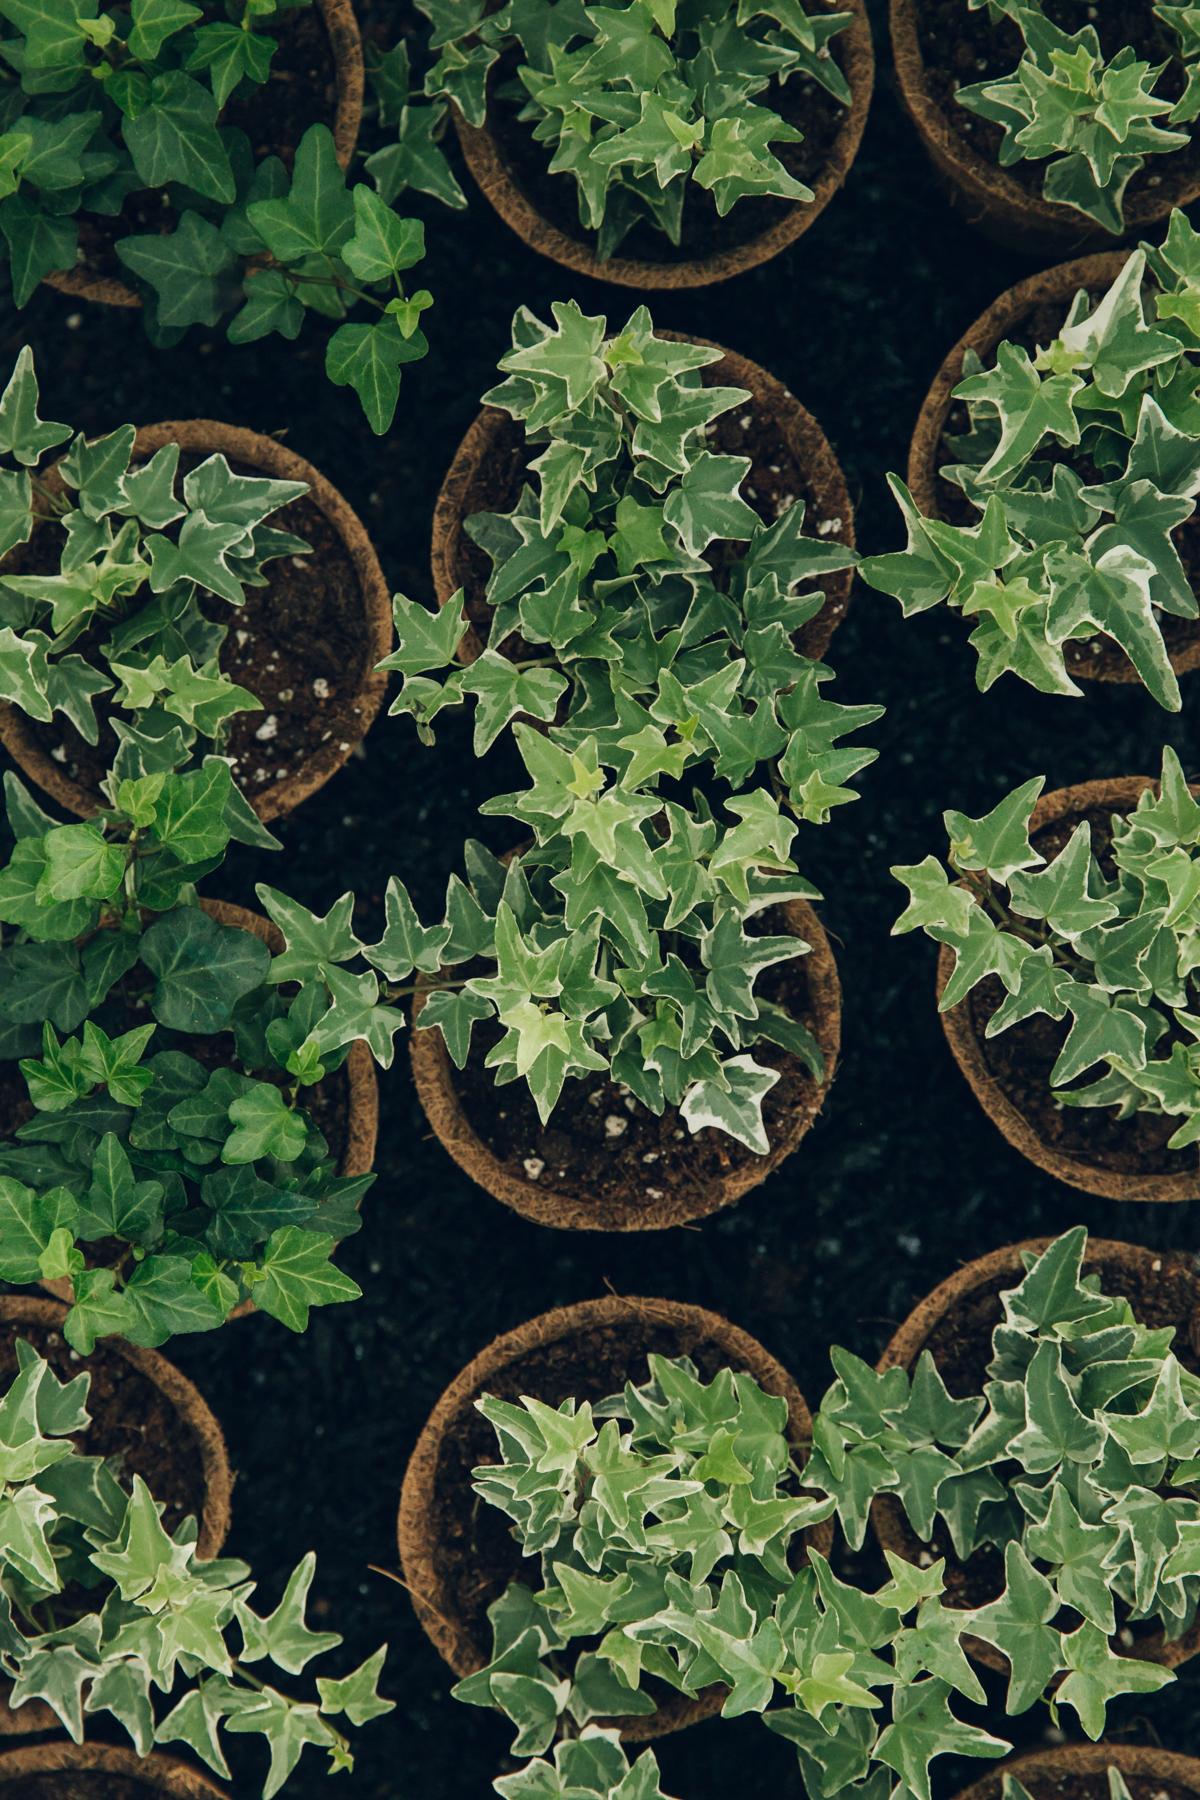 Ivy plants in pots